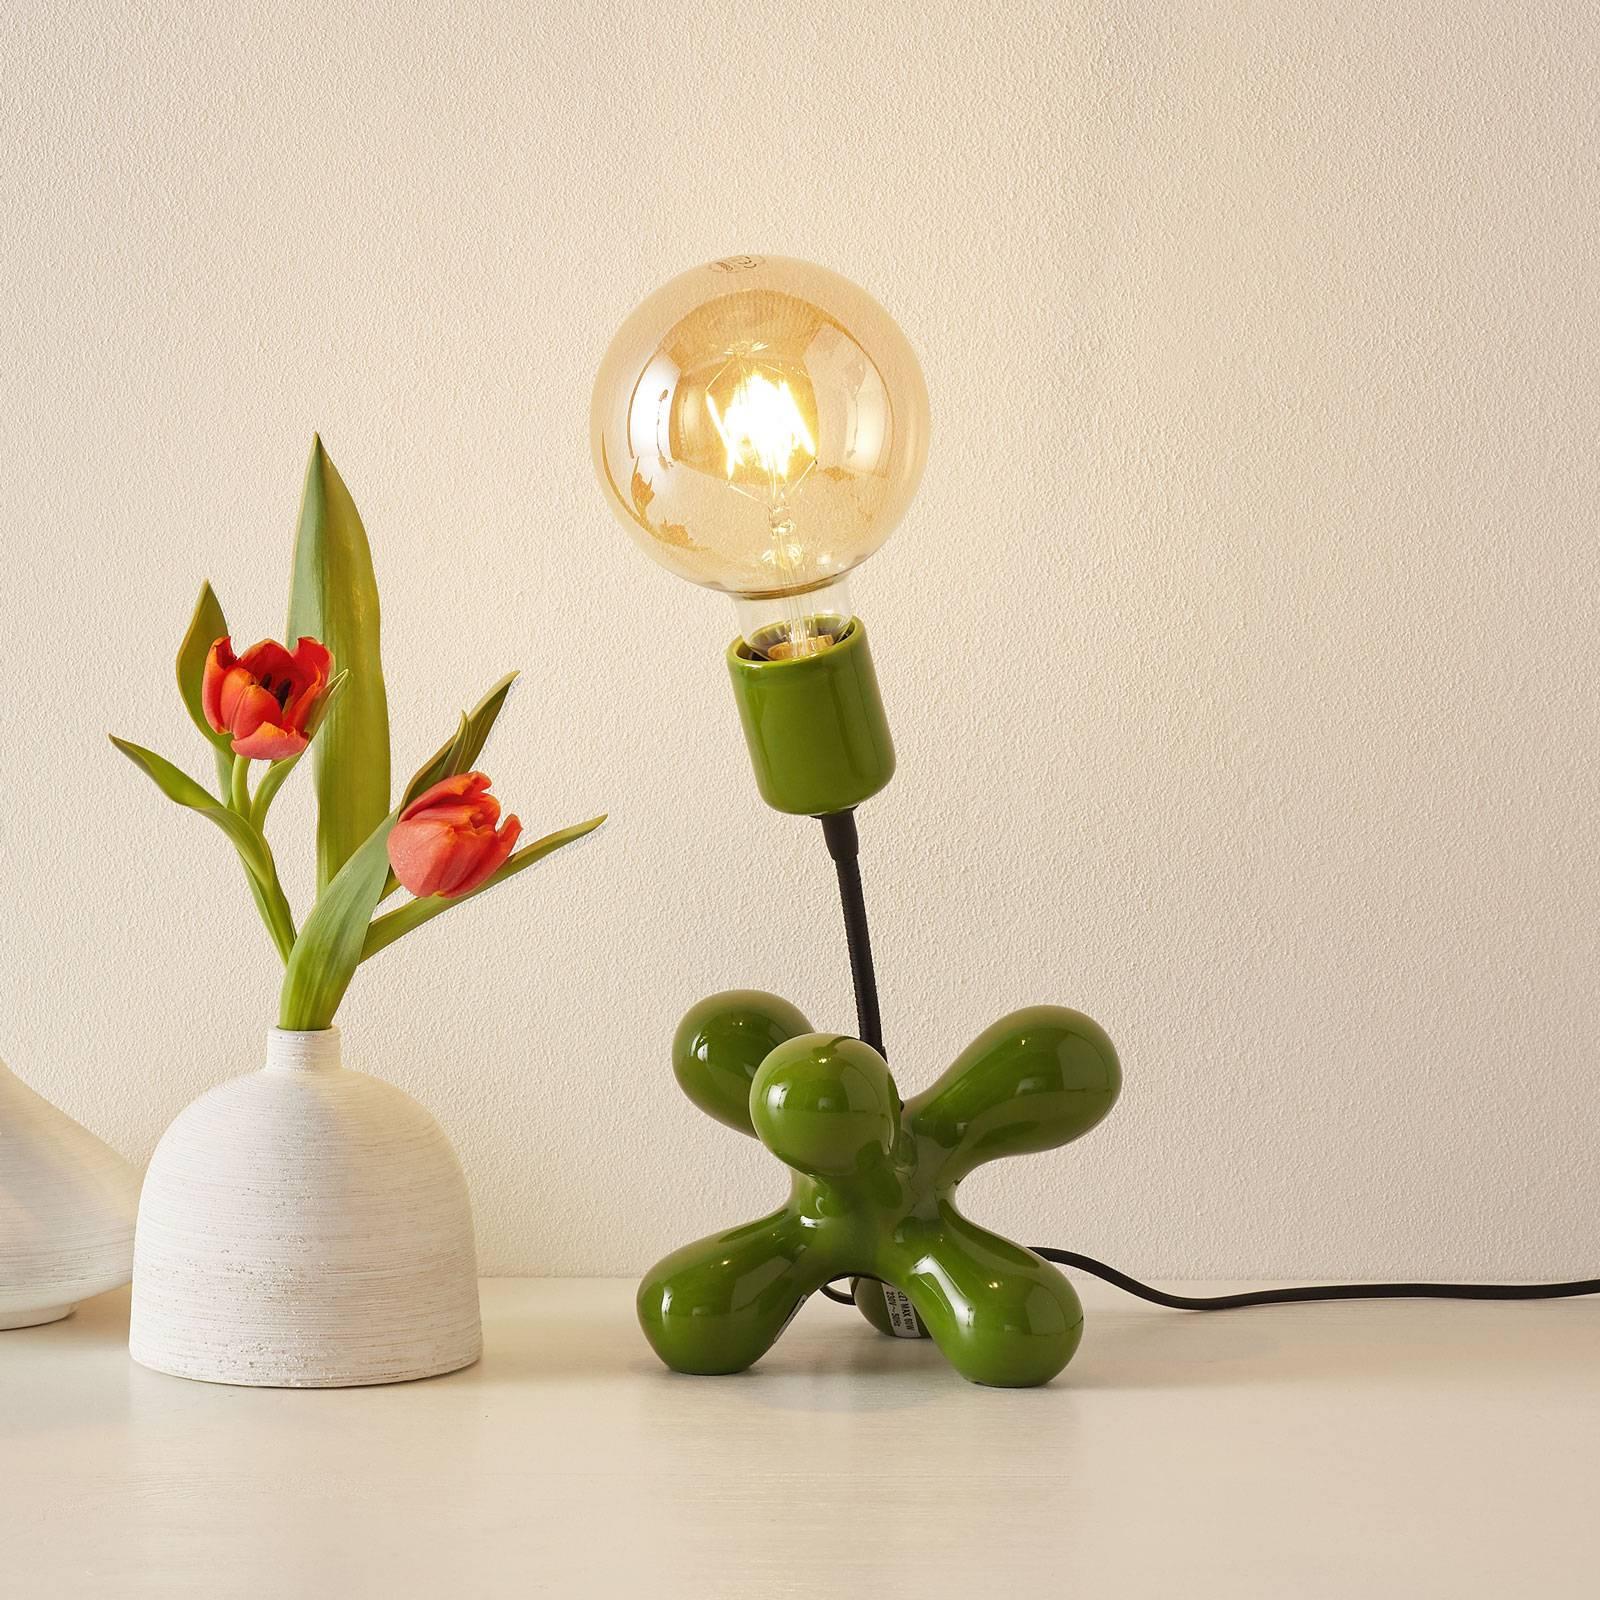 Lampe à poser céram. L181 bras flex vert brillant